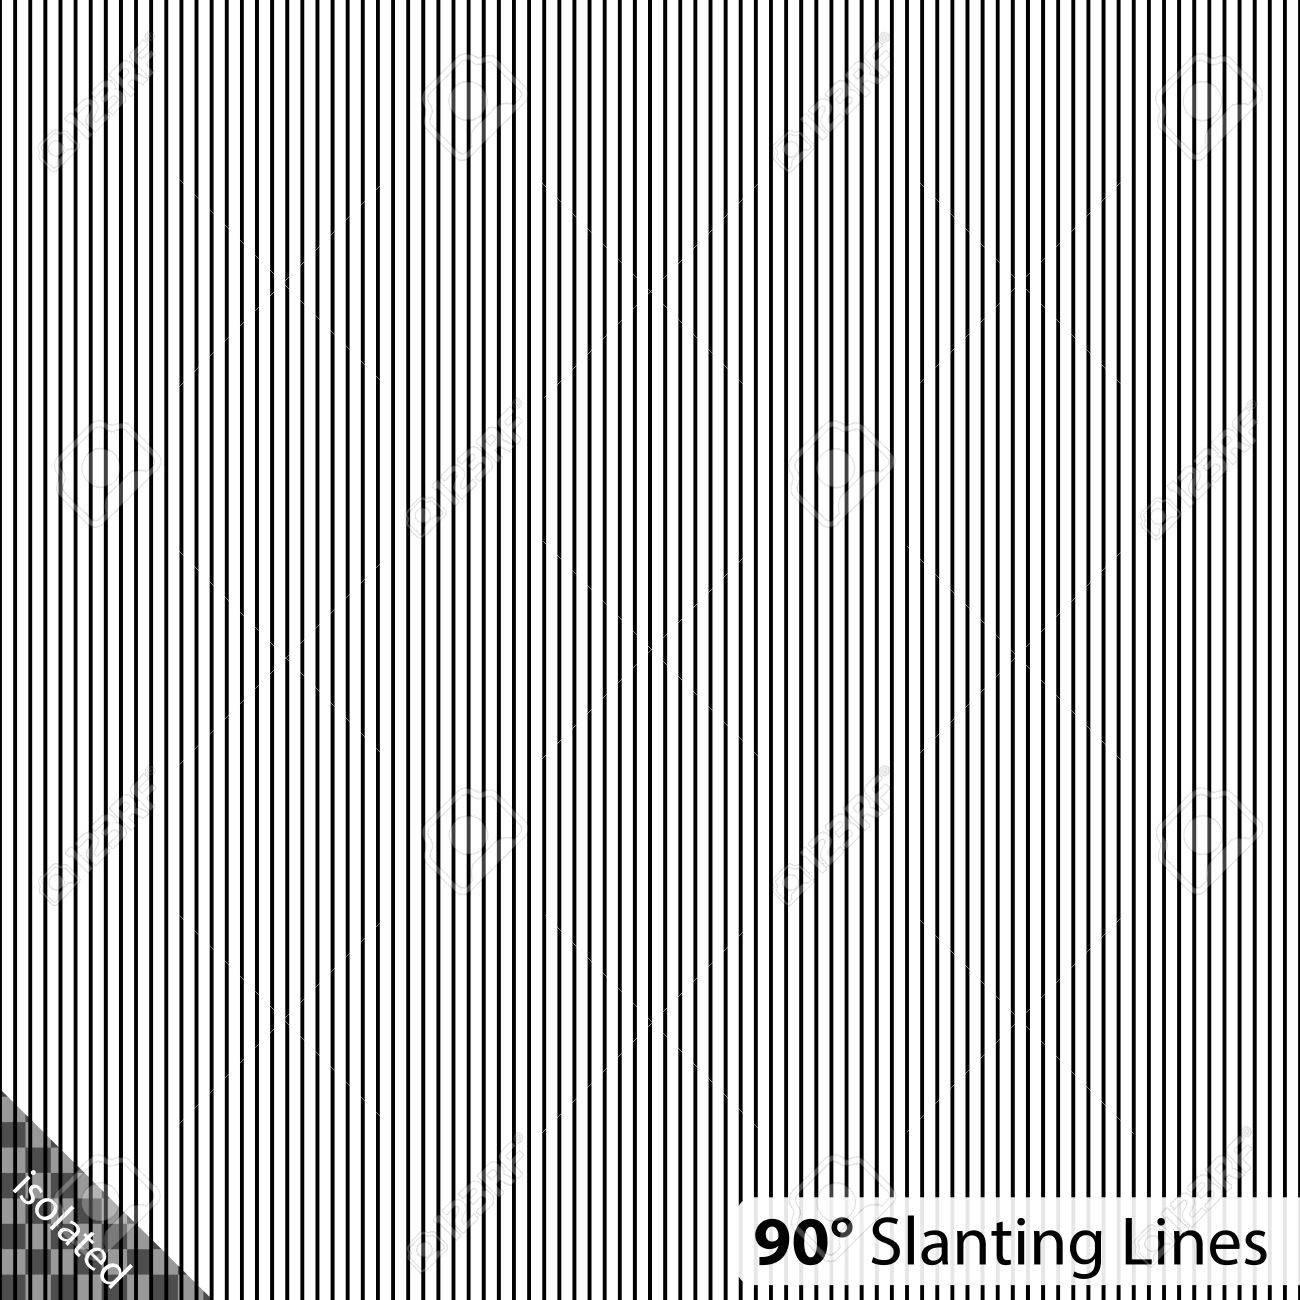 Simple 90 degree vertical Slanting Lines - 51749631